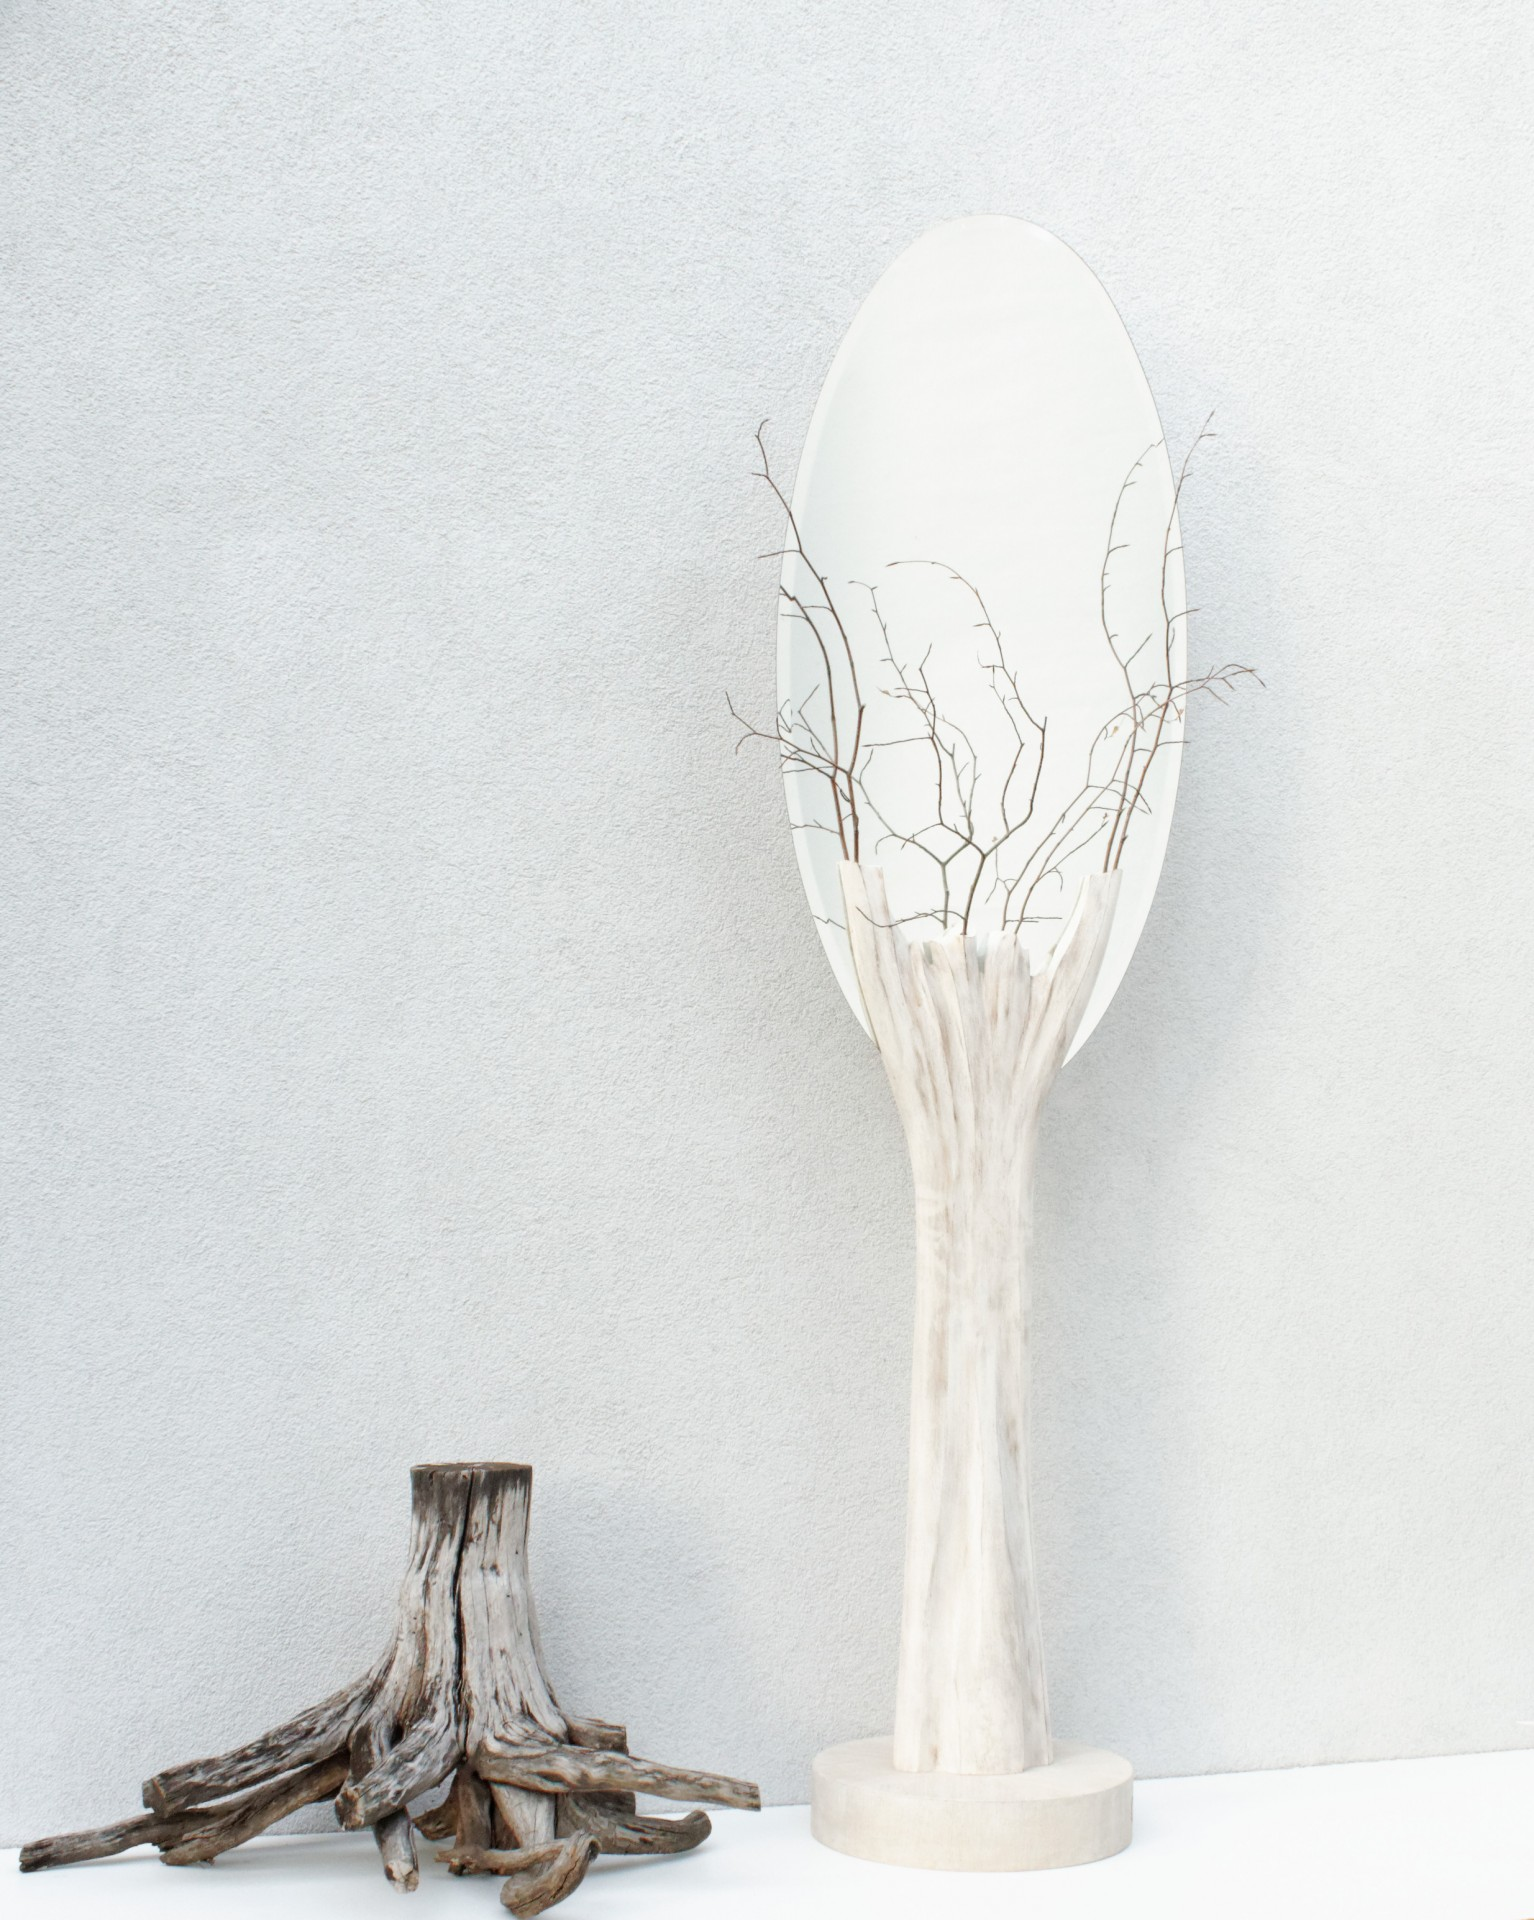 Unikatowe lustro stojące, lustro elipsa, rzeżba